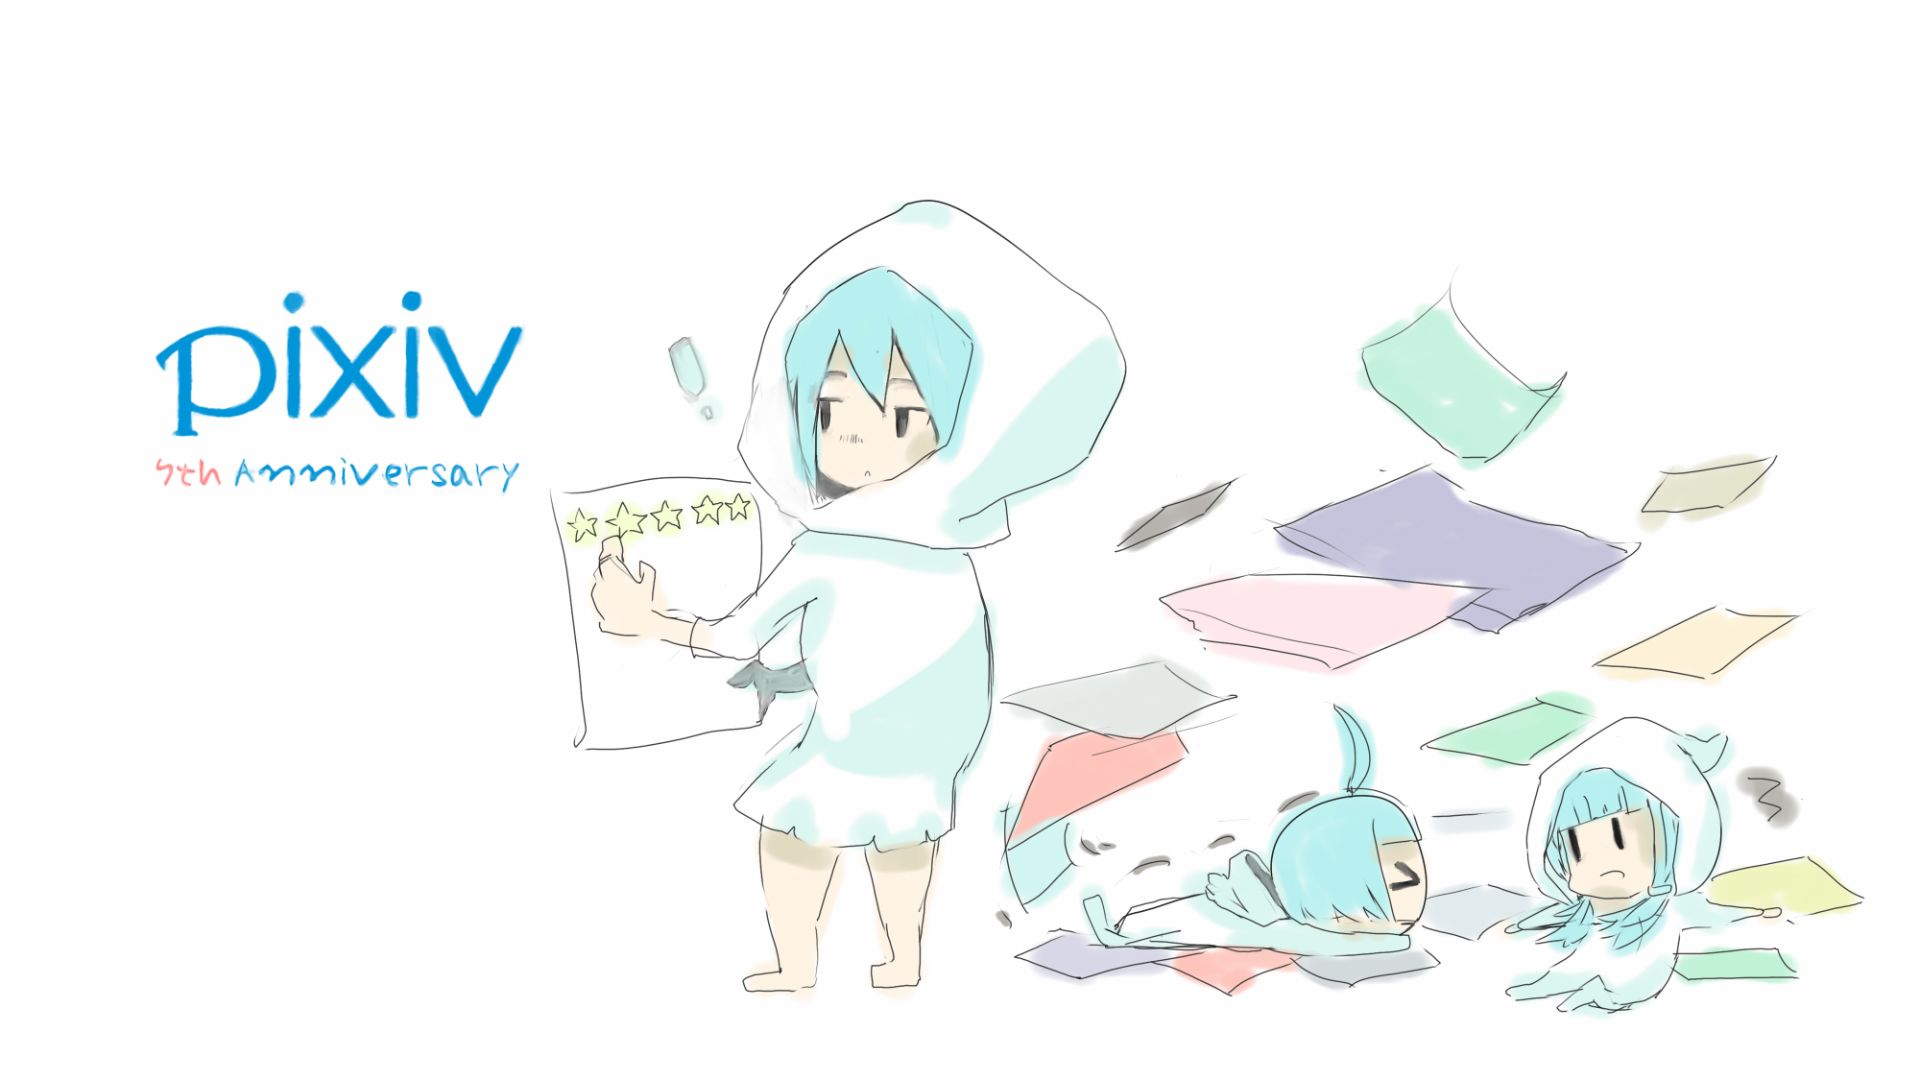 pixiv_7th